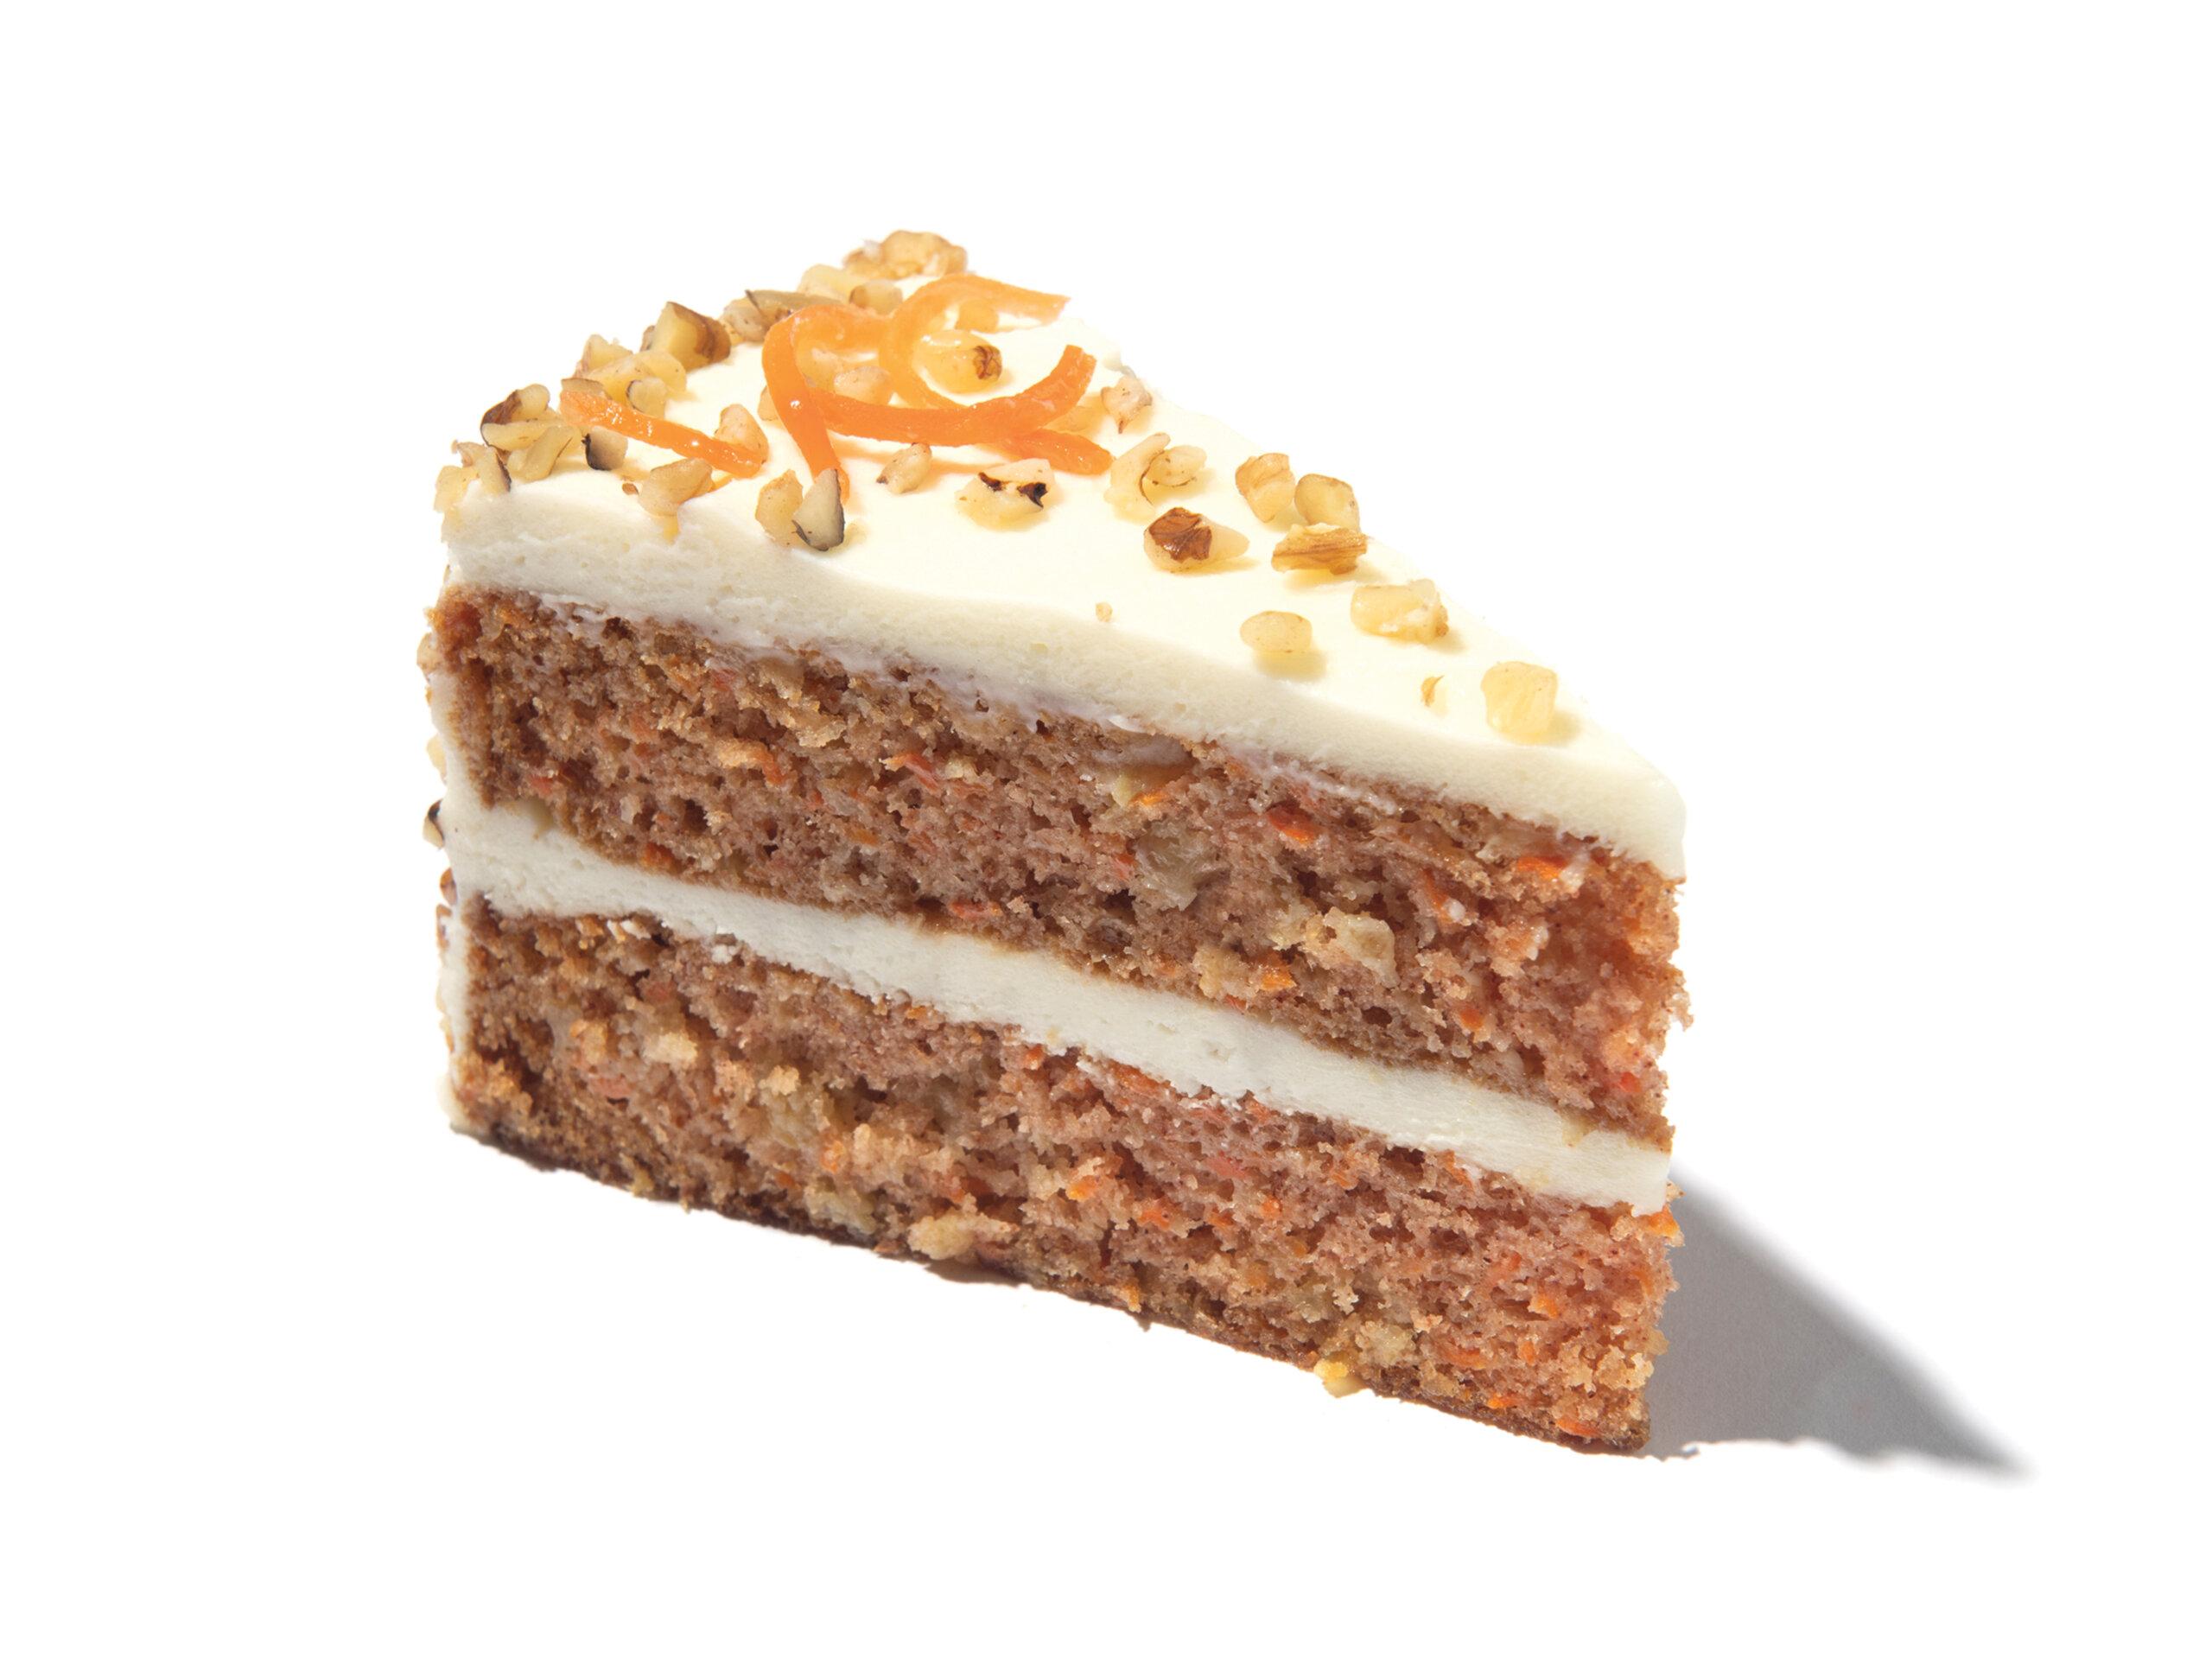 A slice of Eli's Carrot Cake